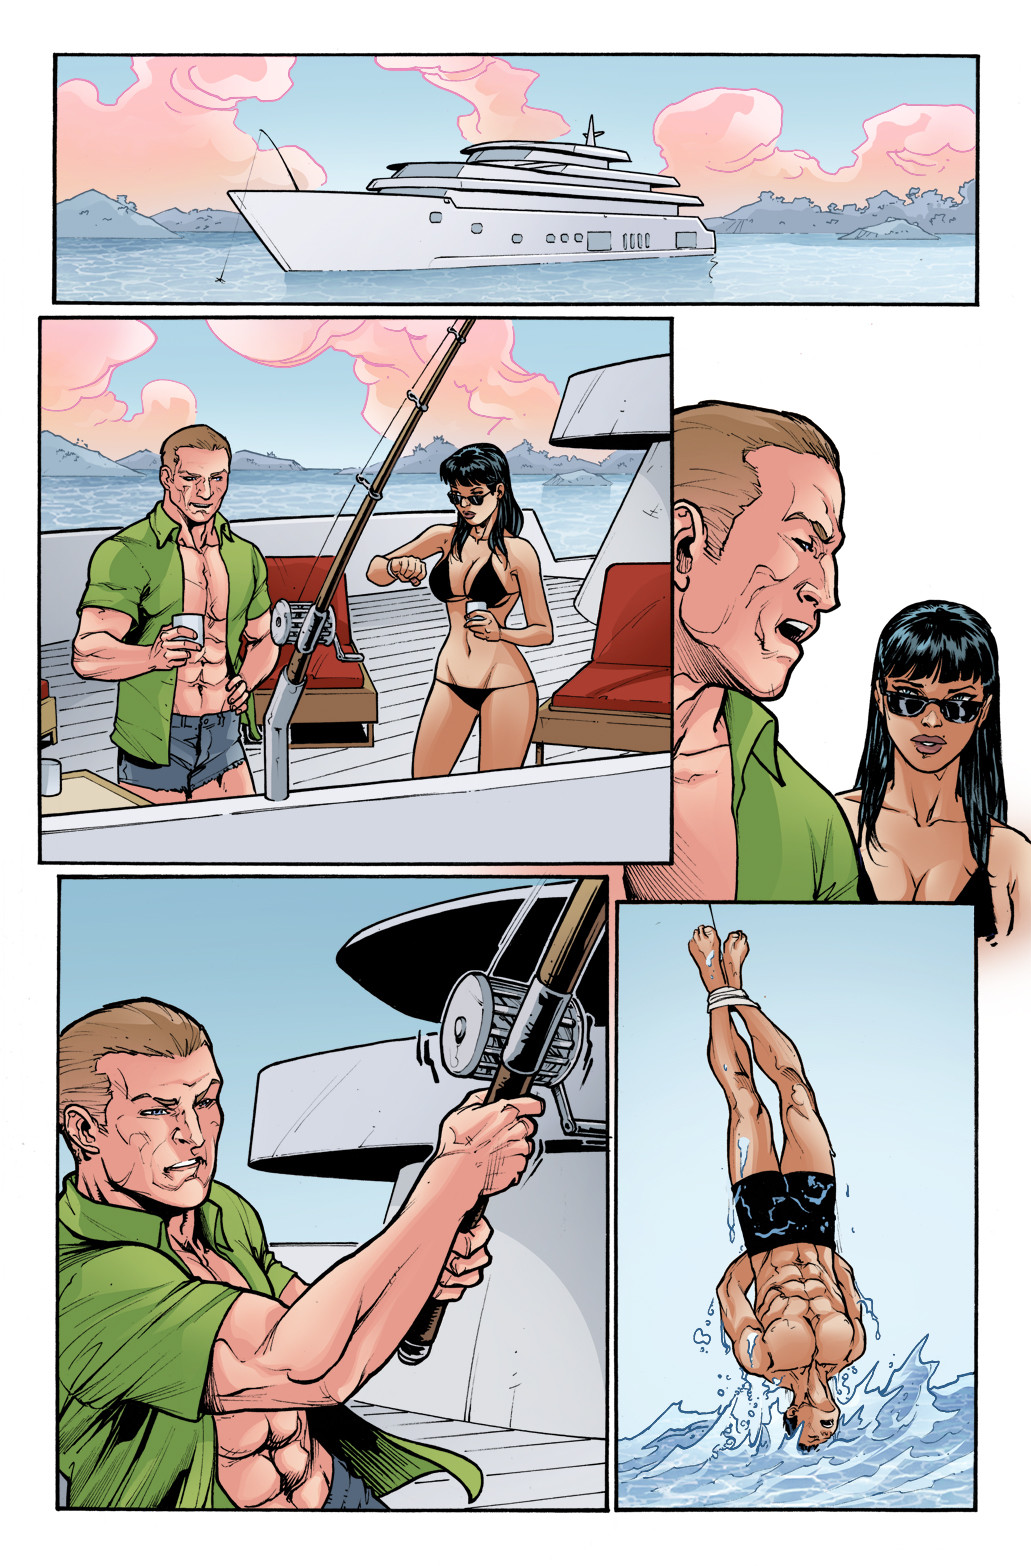 3 GUNS - #4, page 10